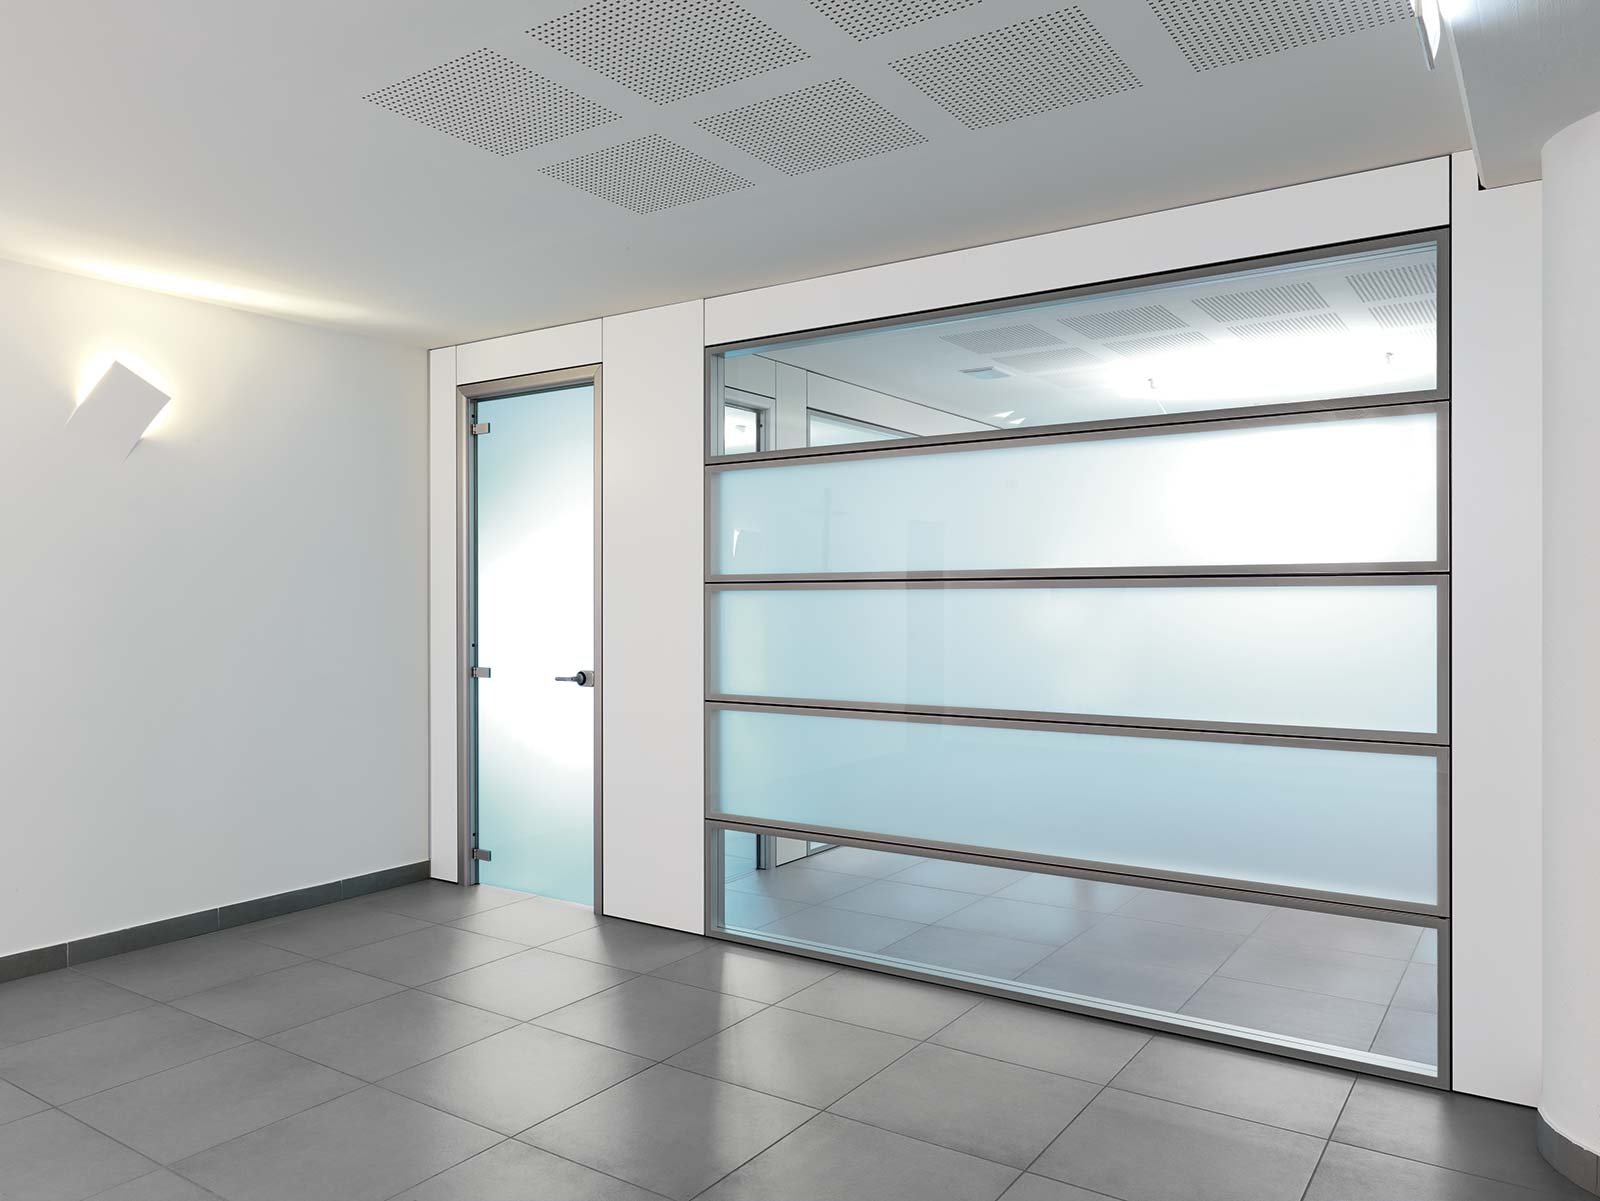 Pareti divisorie dm officina design - Pareti divisorie mobili per abitazioni ...